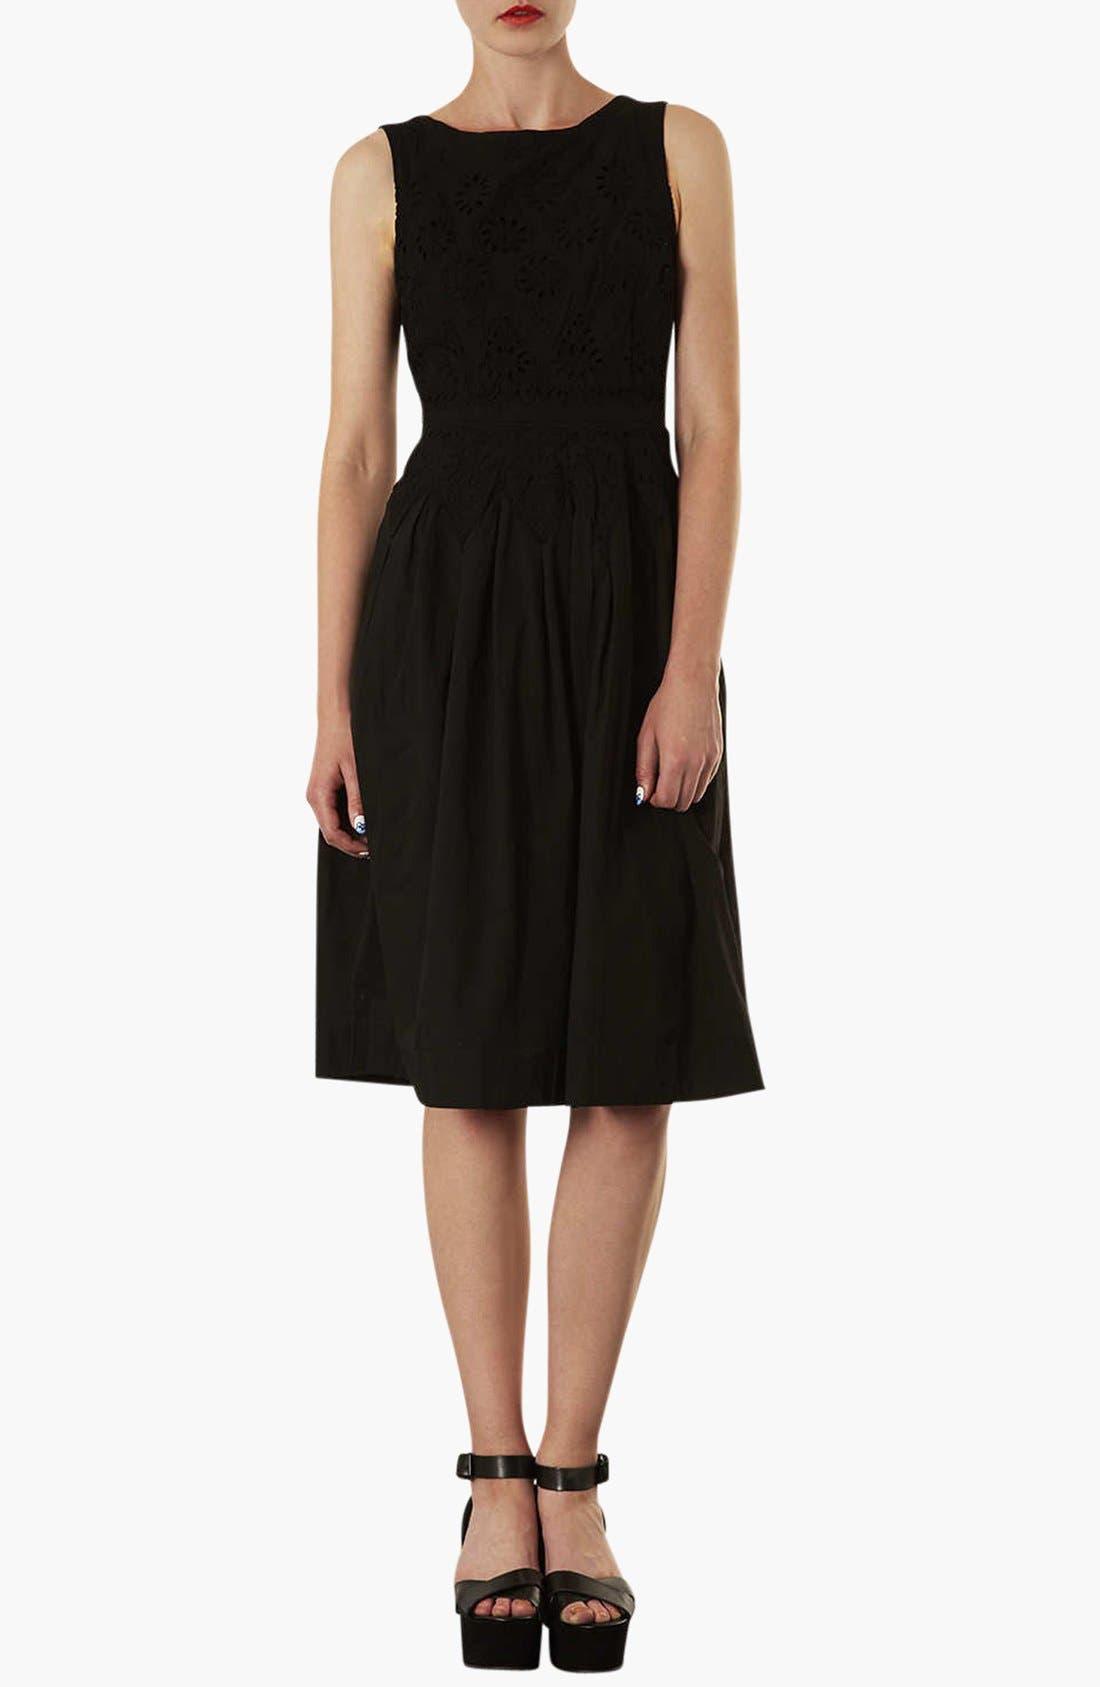 Broderie Midi Dress,                             Main thumbnail 1, color,                             001